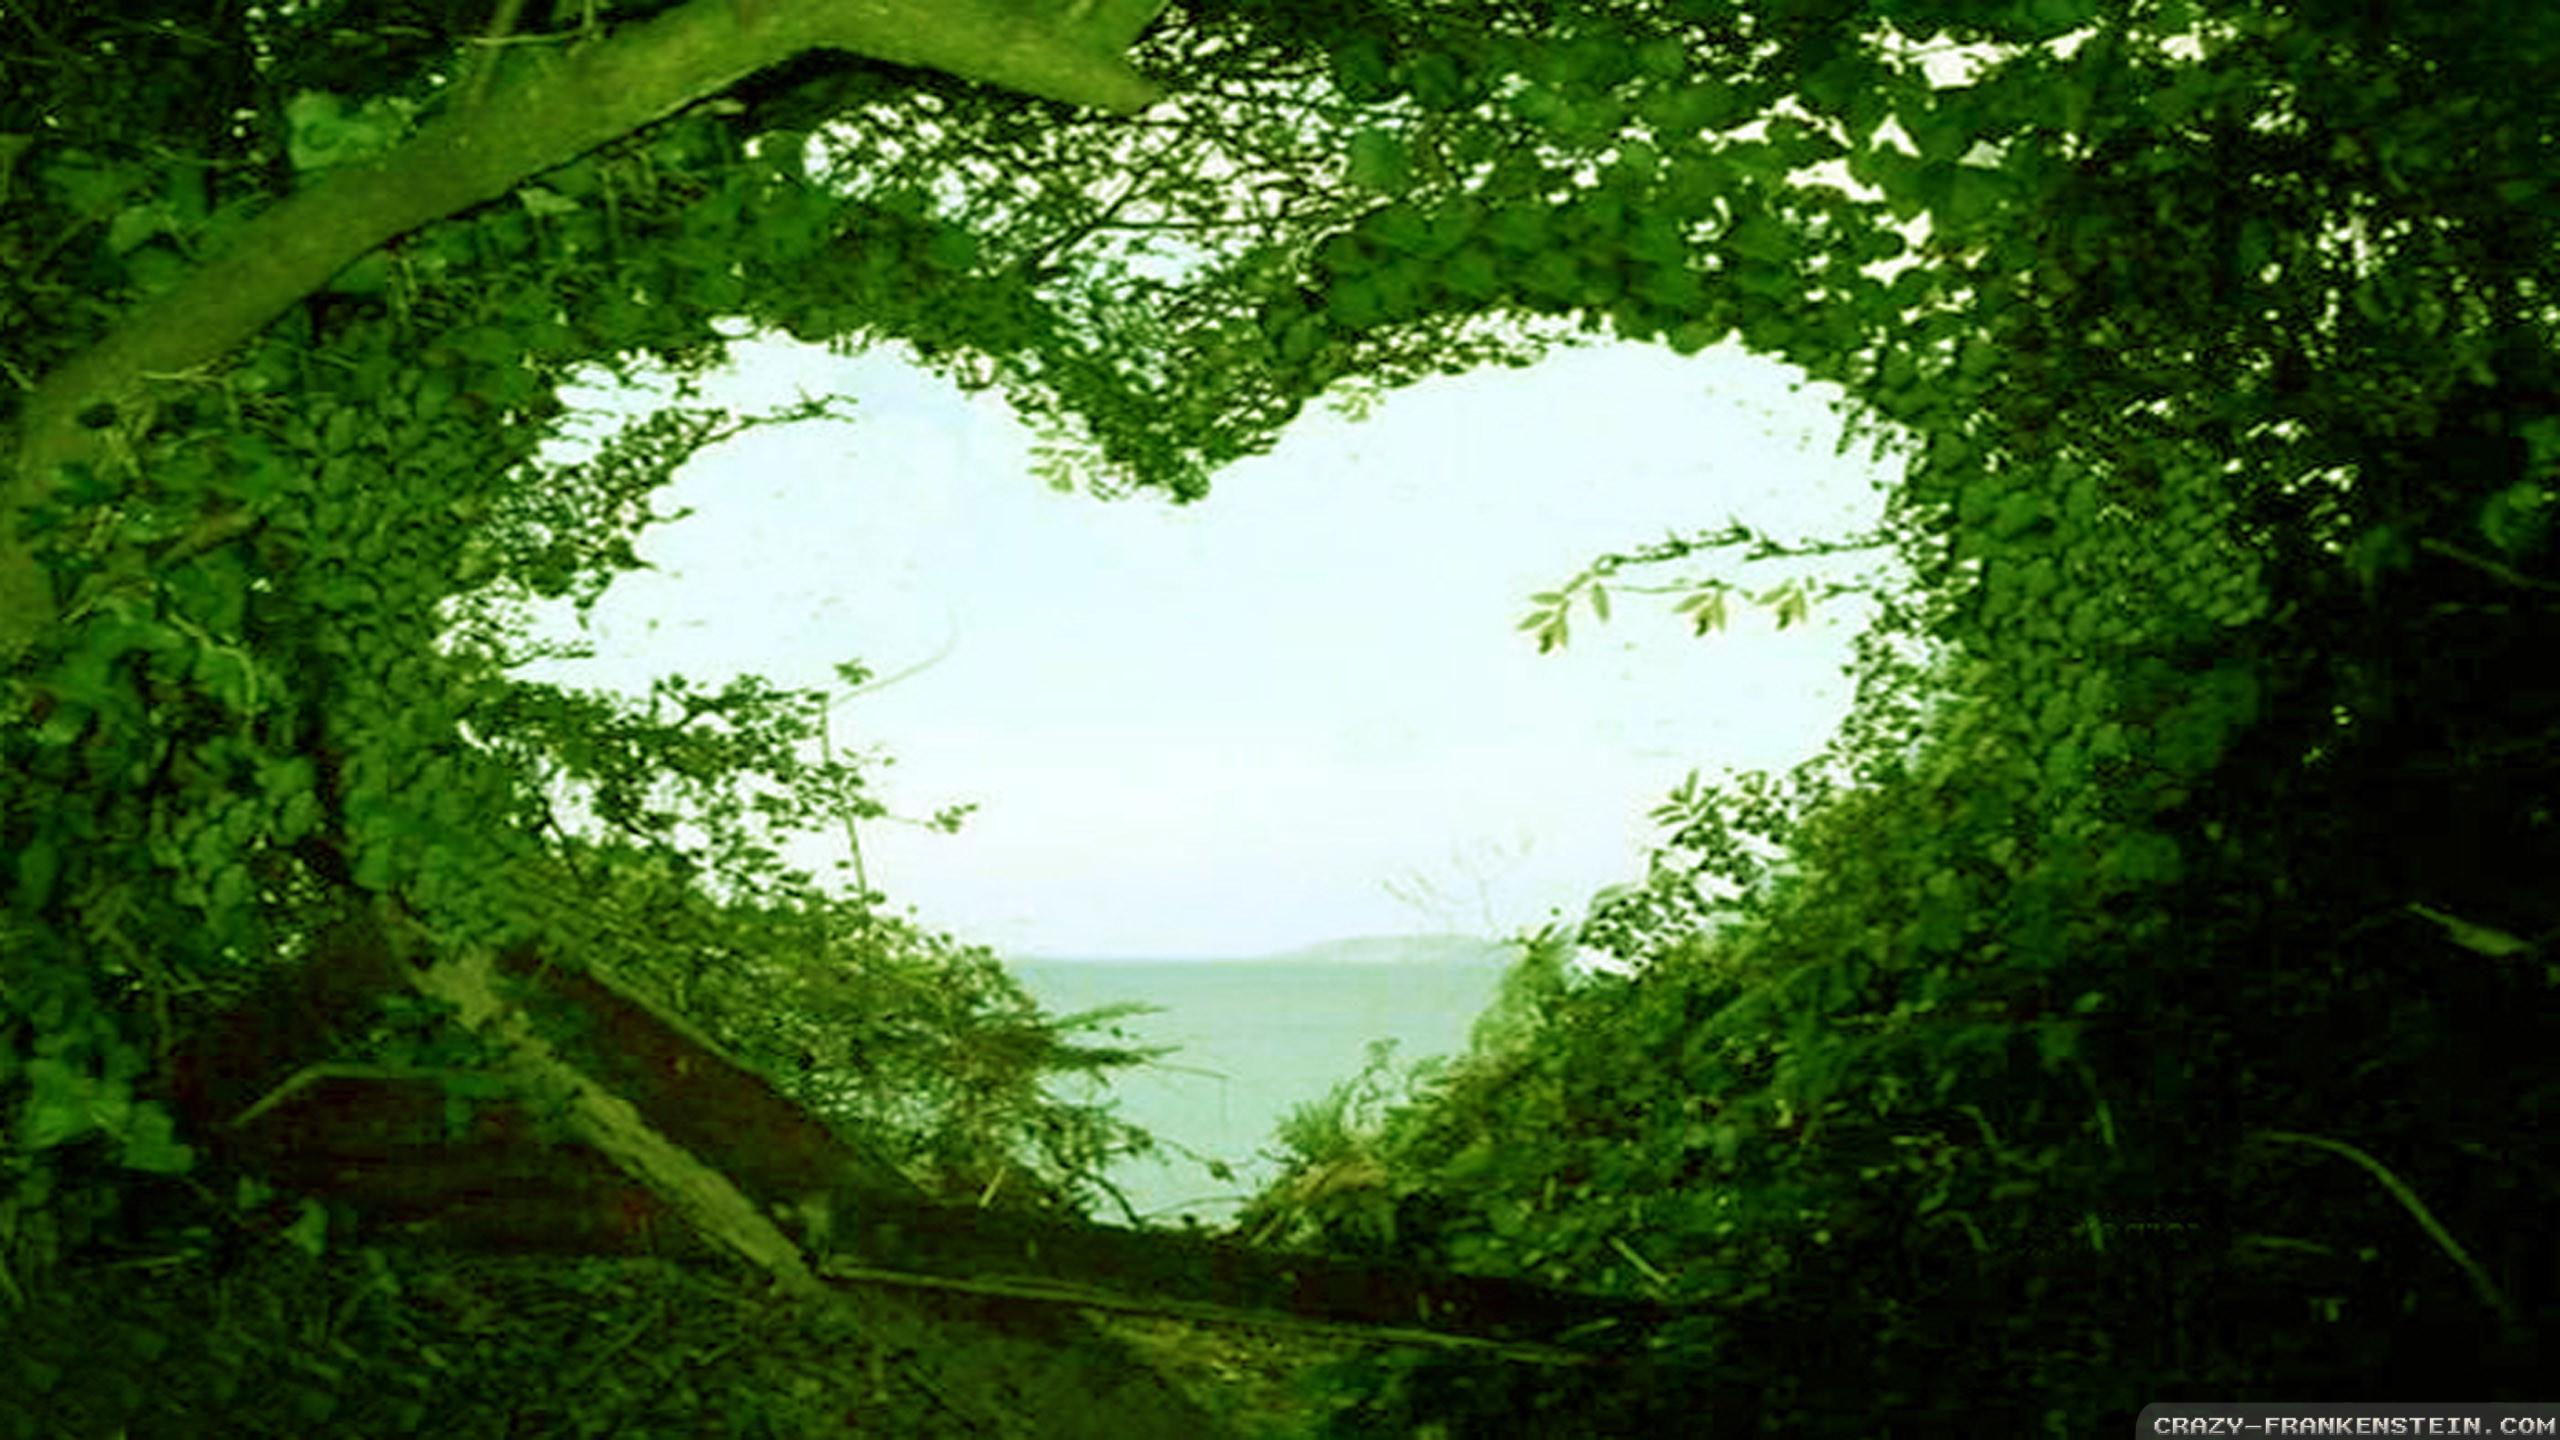 Wallpaper: Beautiful love nature wallpapers. Resolution: 1024×768    1280×1024   1600×1200. Widescreen Res: 1440×900   1680×1050   1920×1200